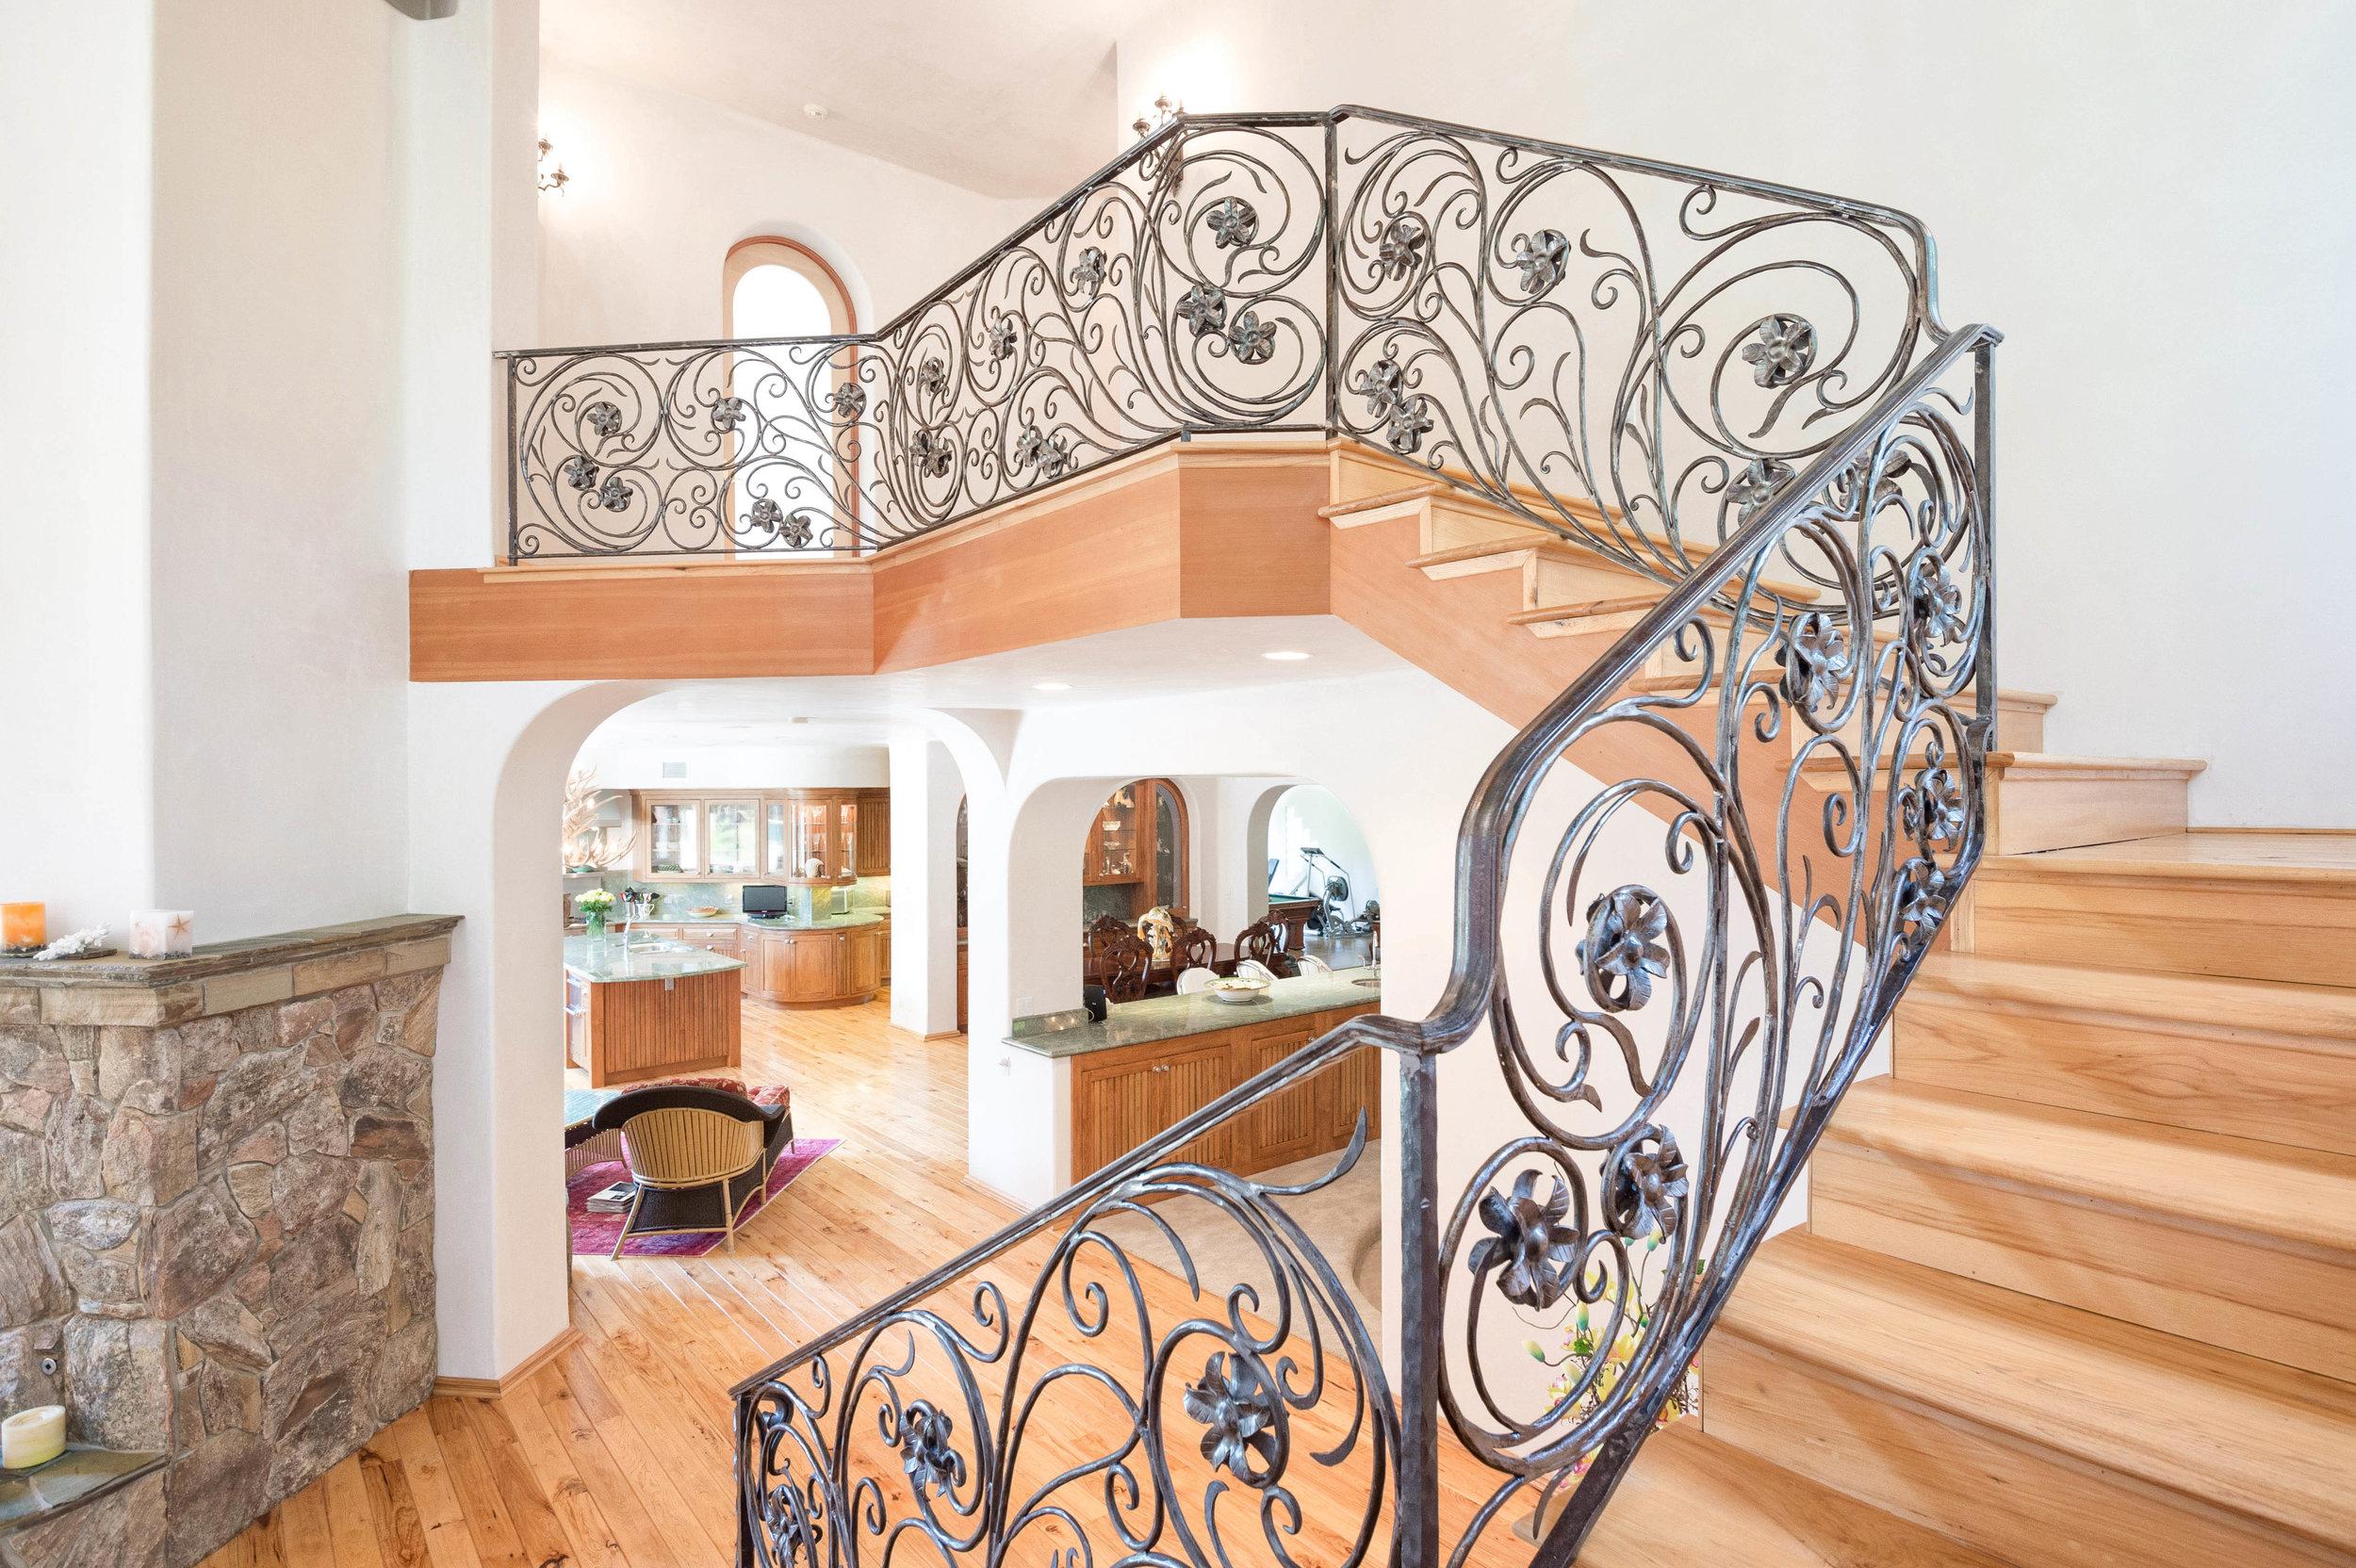 011 stairs 2 6405 bonsall Malibu For Sale The Malibu Life Team Luxury Real Estate.jpg